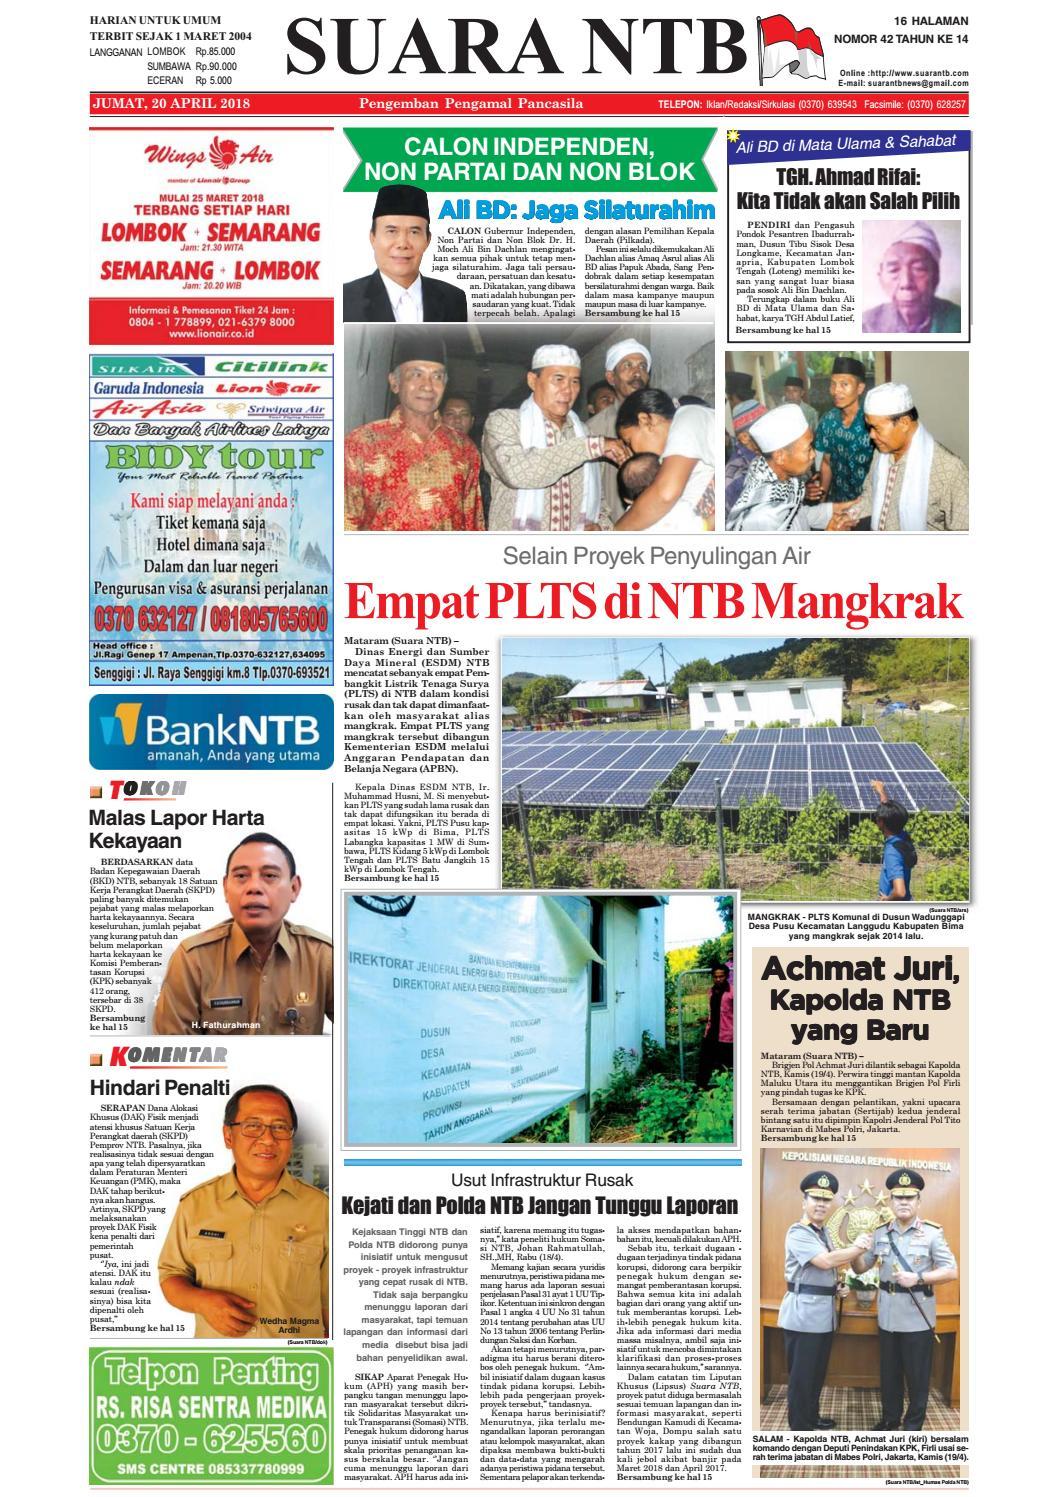 Edisi Jumat 20 April 2018 Suara Ntb By E Paper Kmb Issuu Produk Ukm Bumn Wisata Mewah Bali 3hr 2mlm